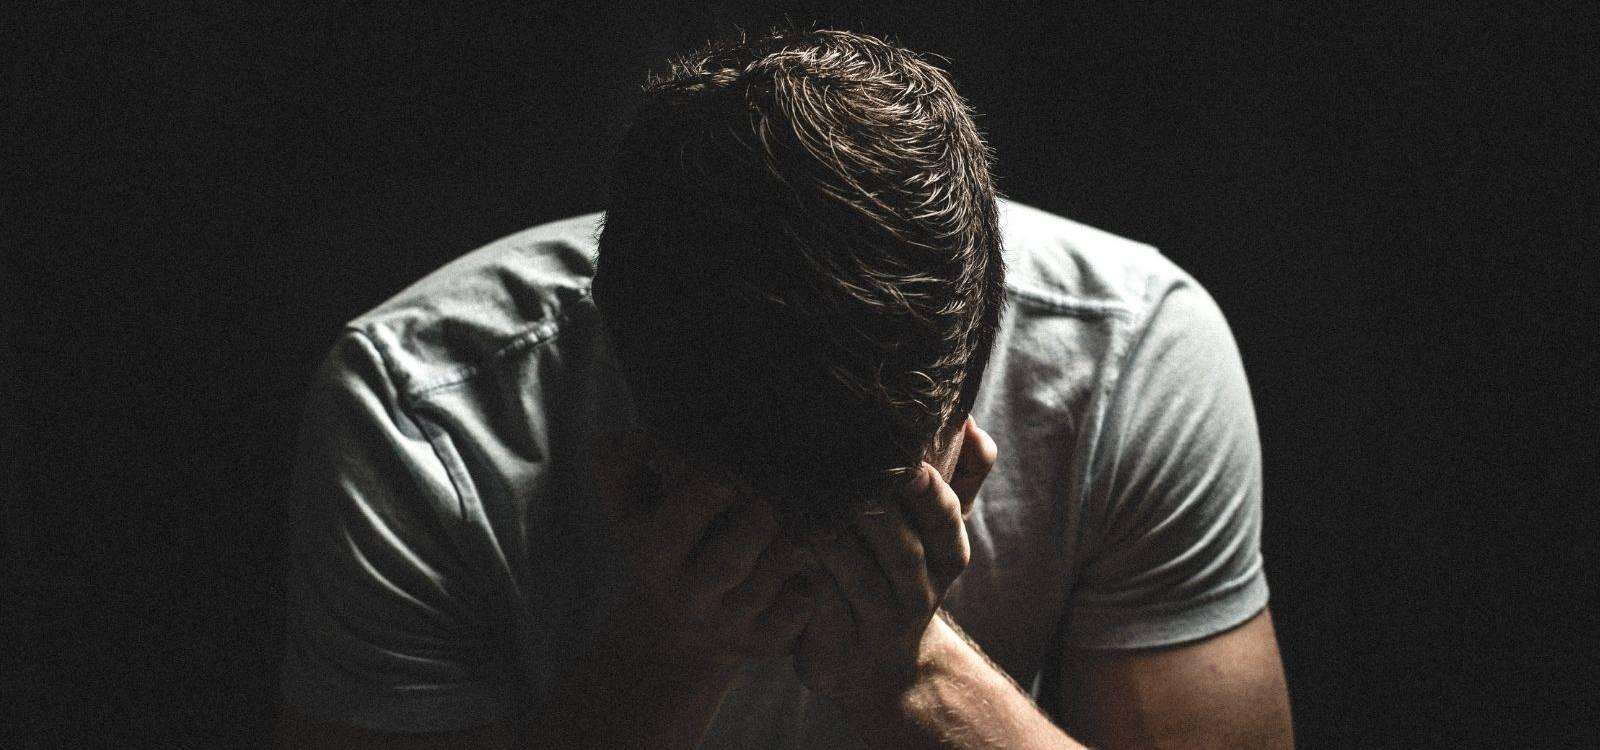 Pelvic Pain (Men) treatments from Tracey Miles Physio near Canterbury Kent